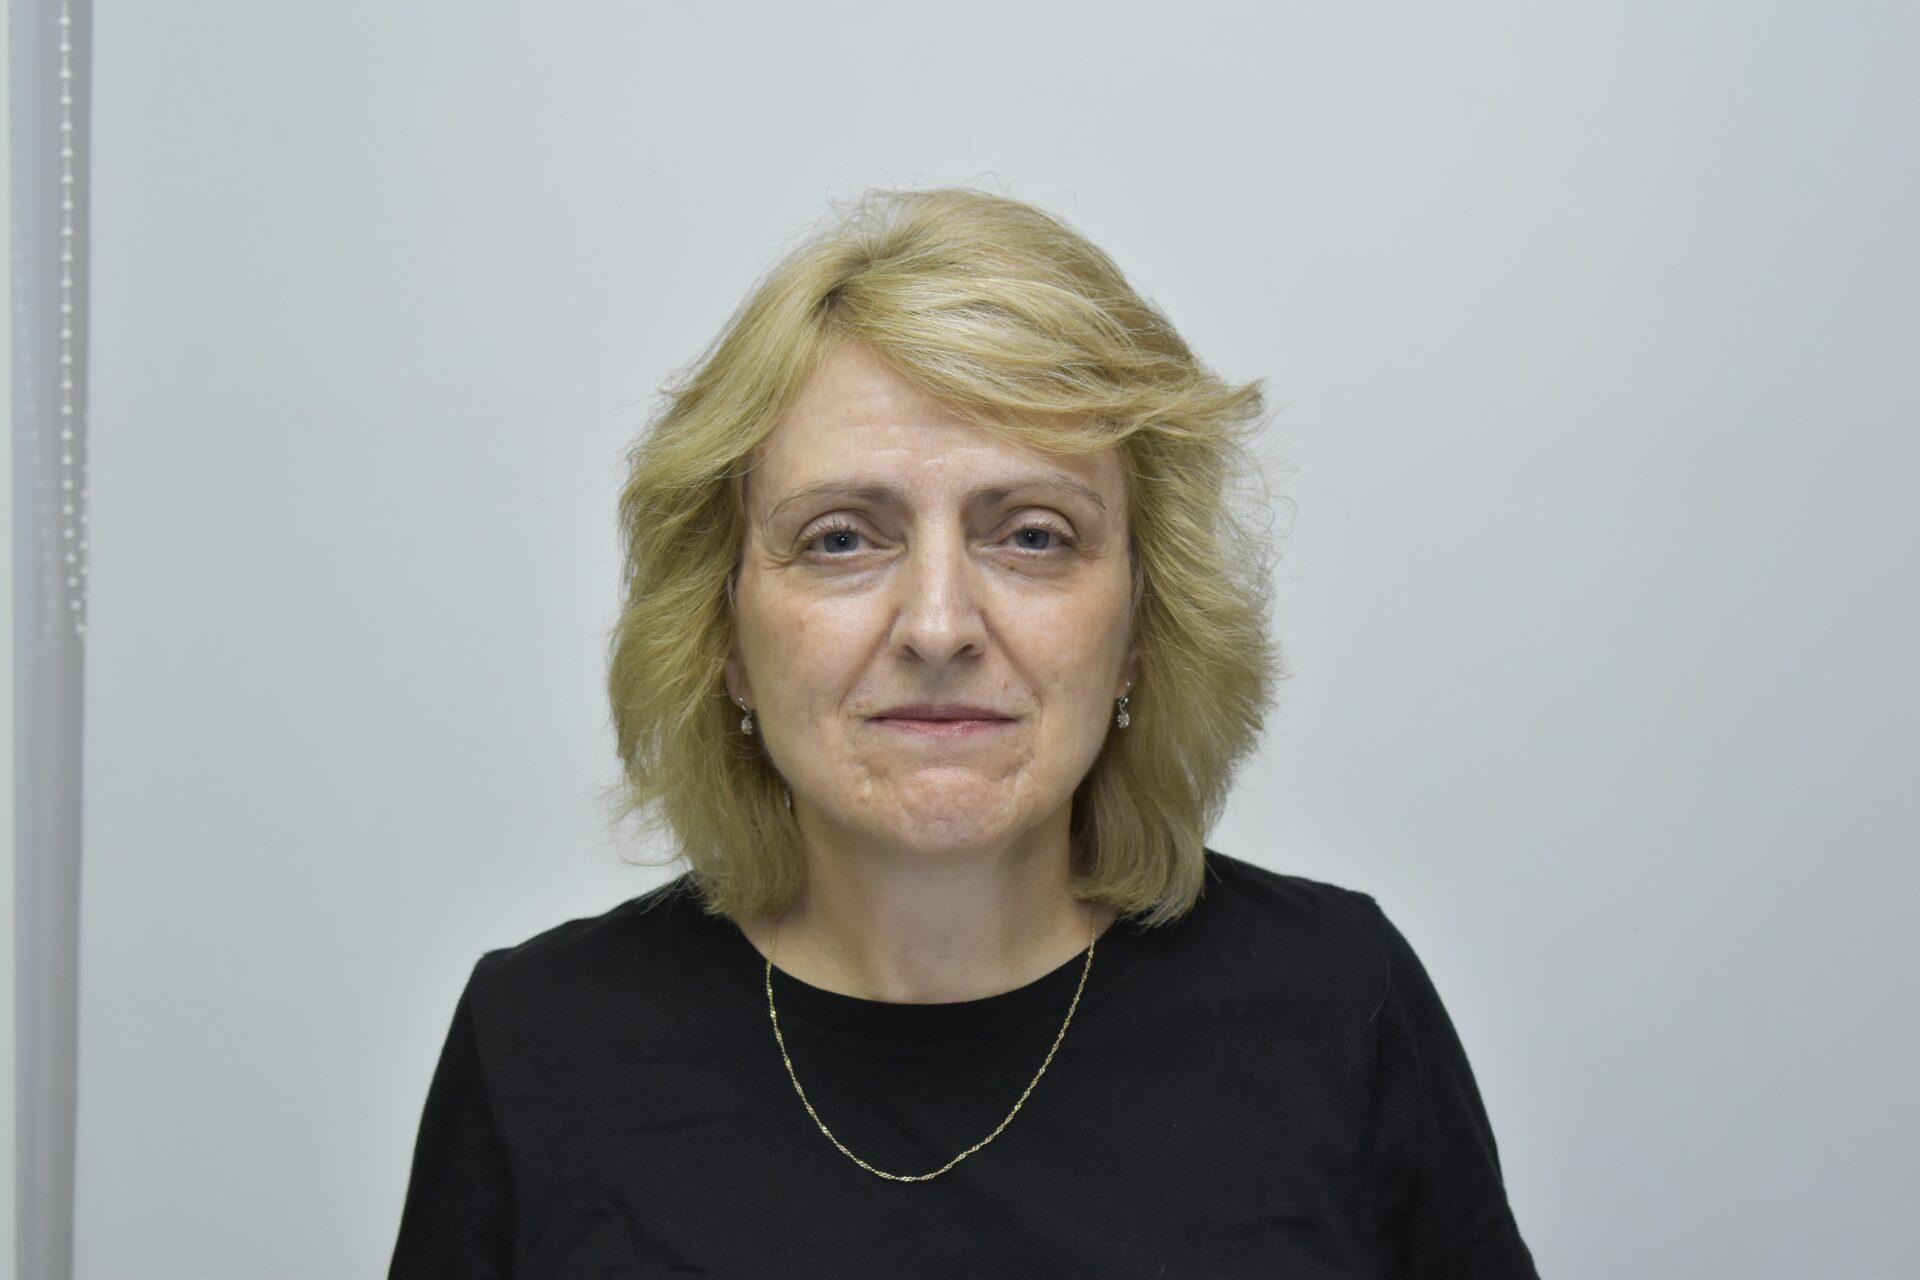 Portrait Julie Evans, UK